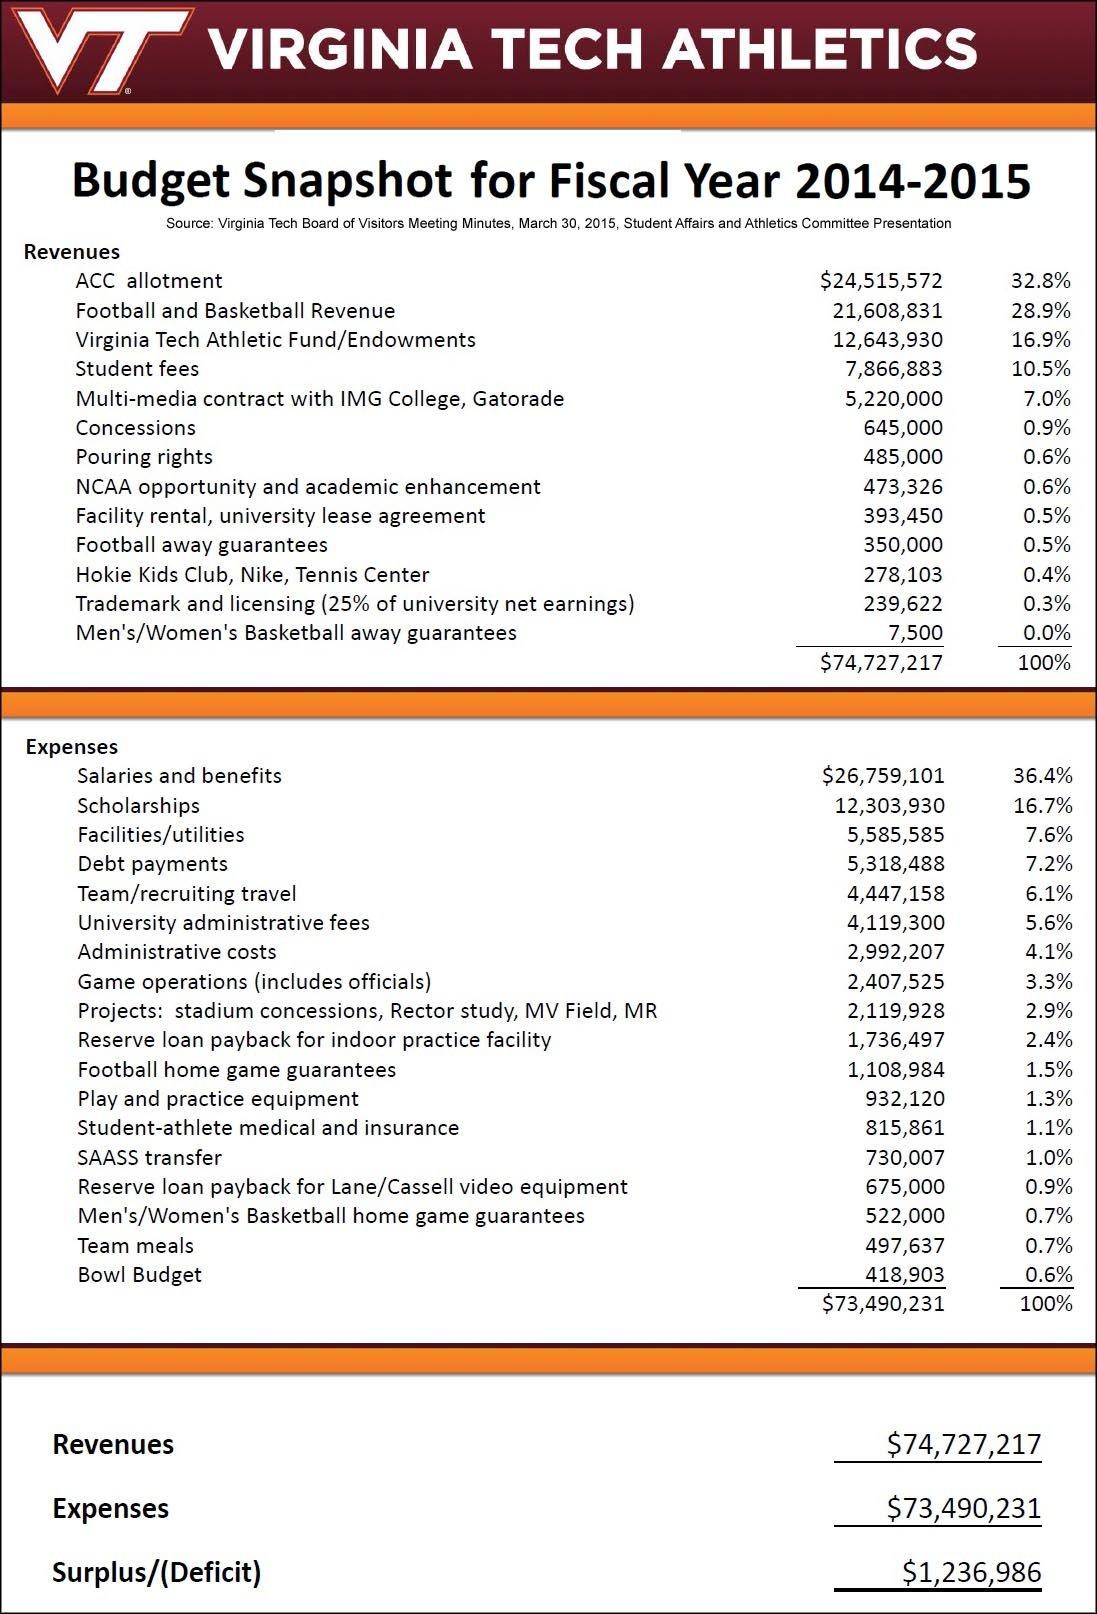 Virginia Tech Athletics 2014-15 Budget Snapshot